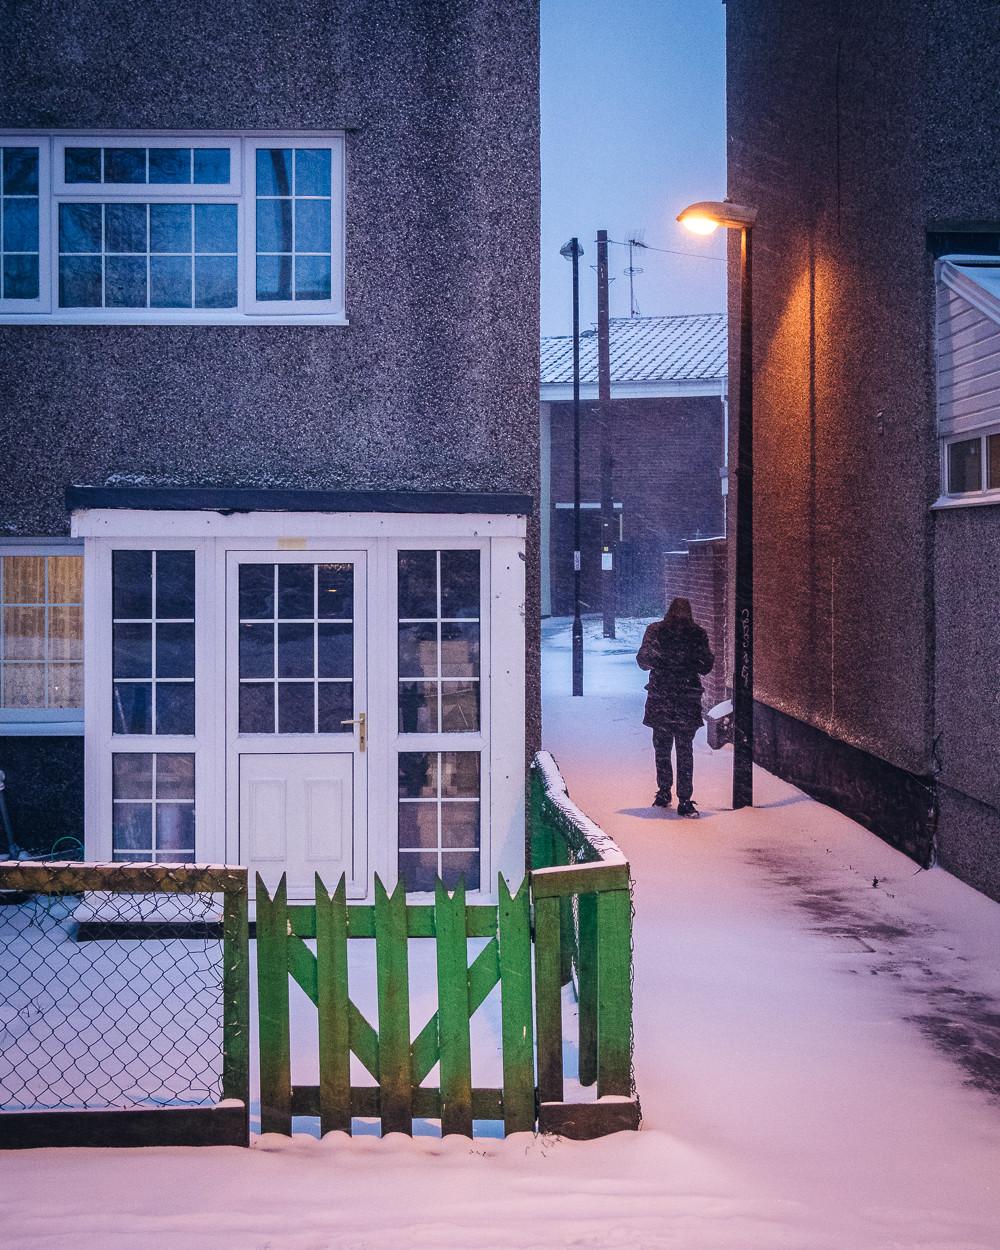 Green Gate on Snowy Night